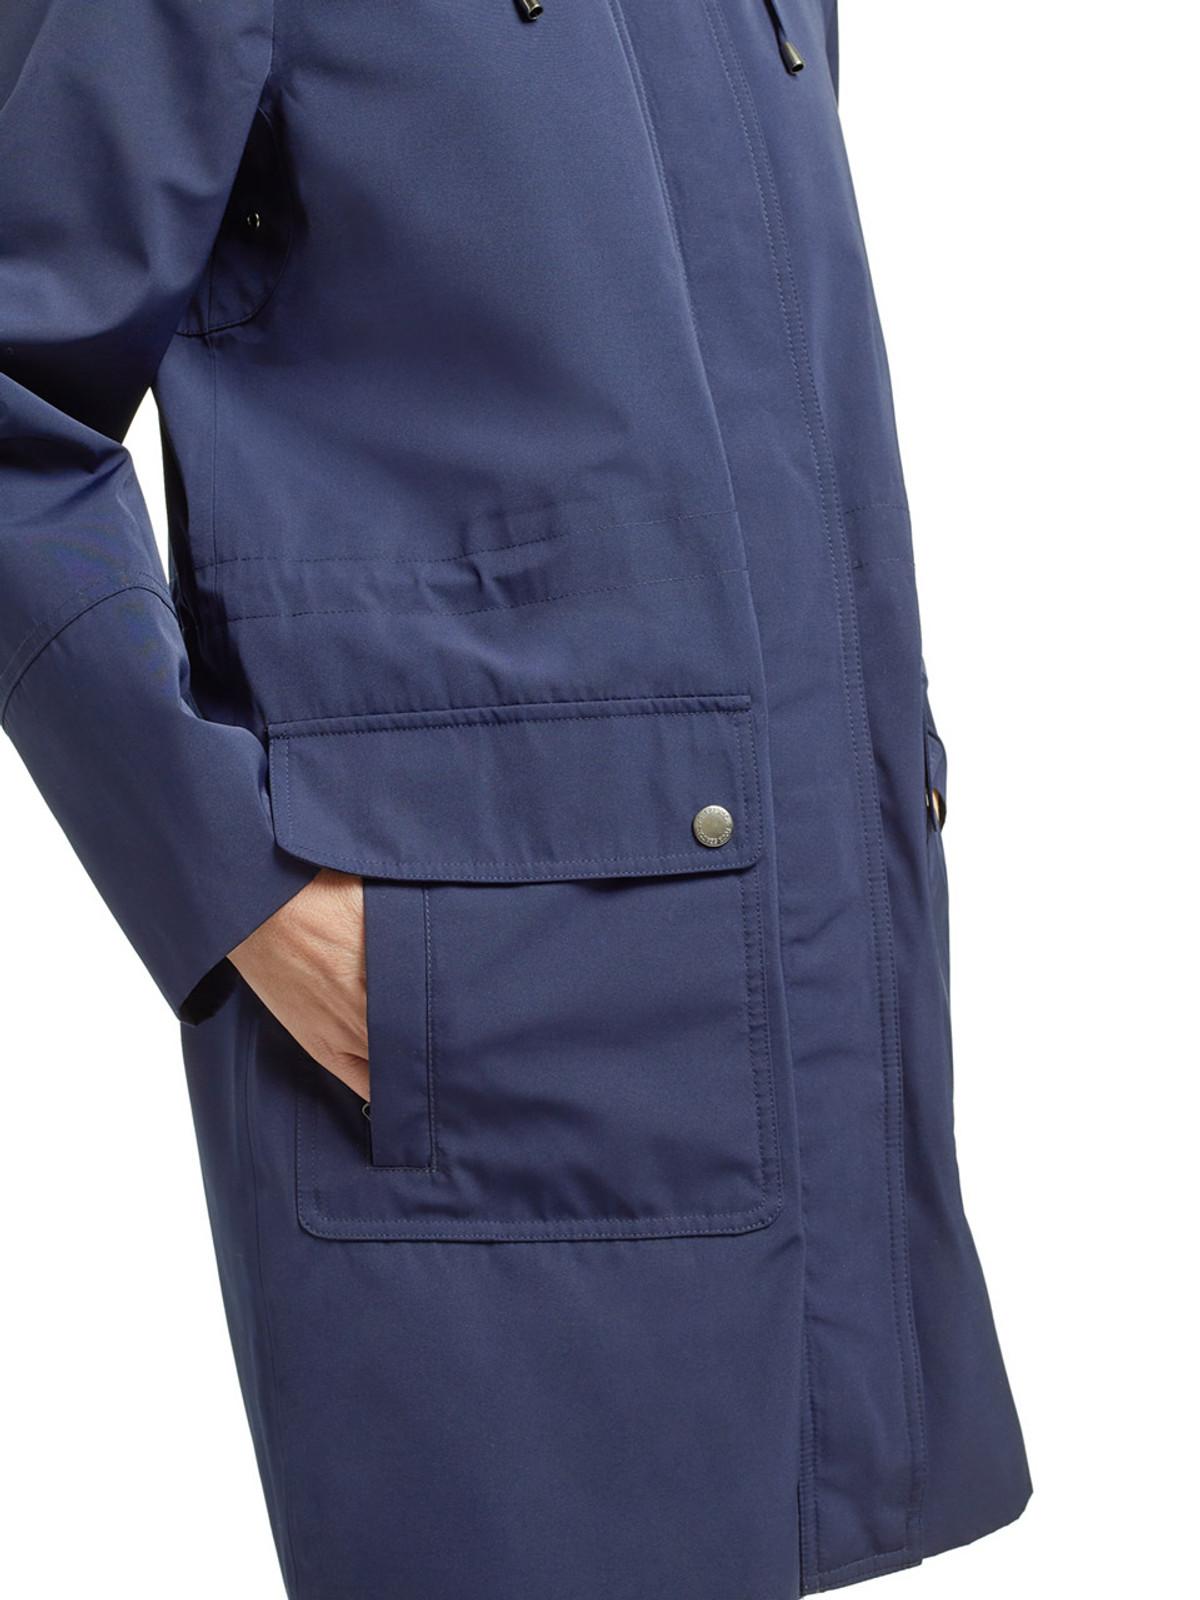 CAMBER – Long Performance Jacket, Navy